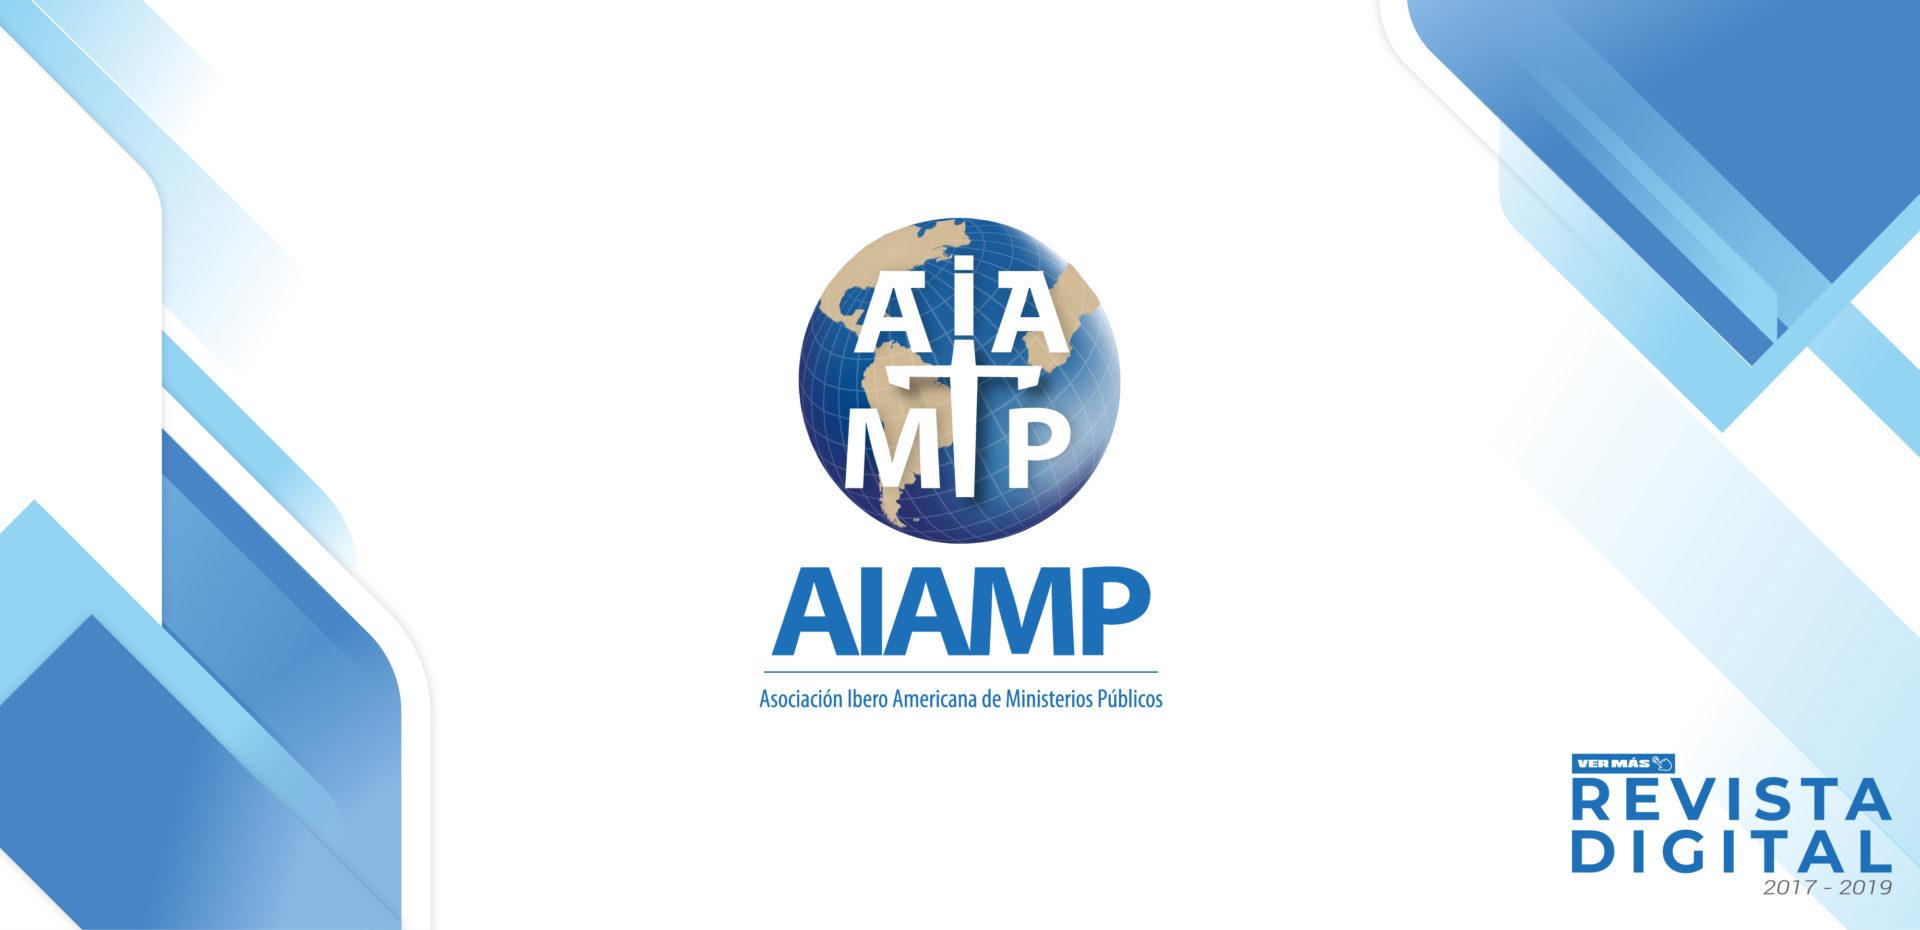 Revista Digital AIAMP